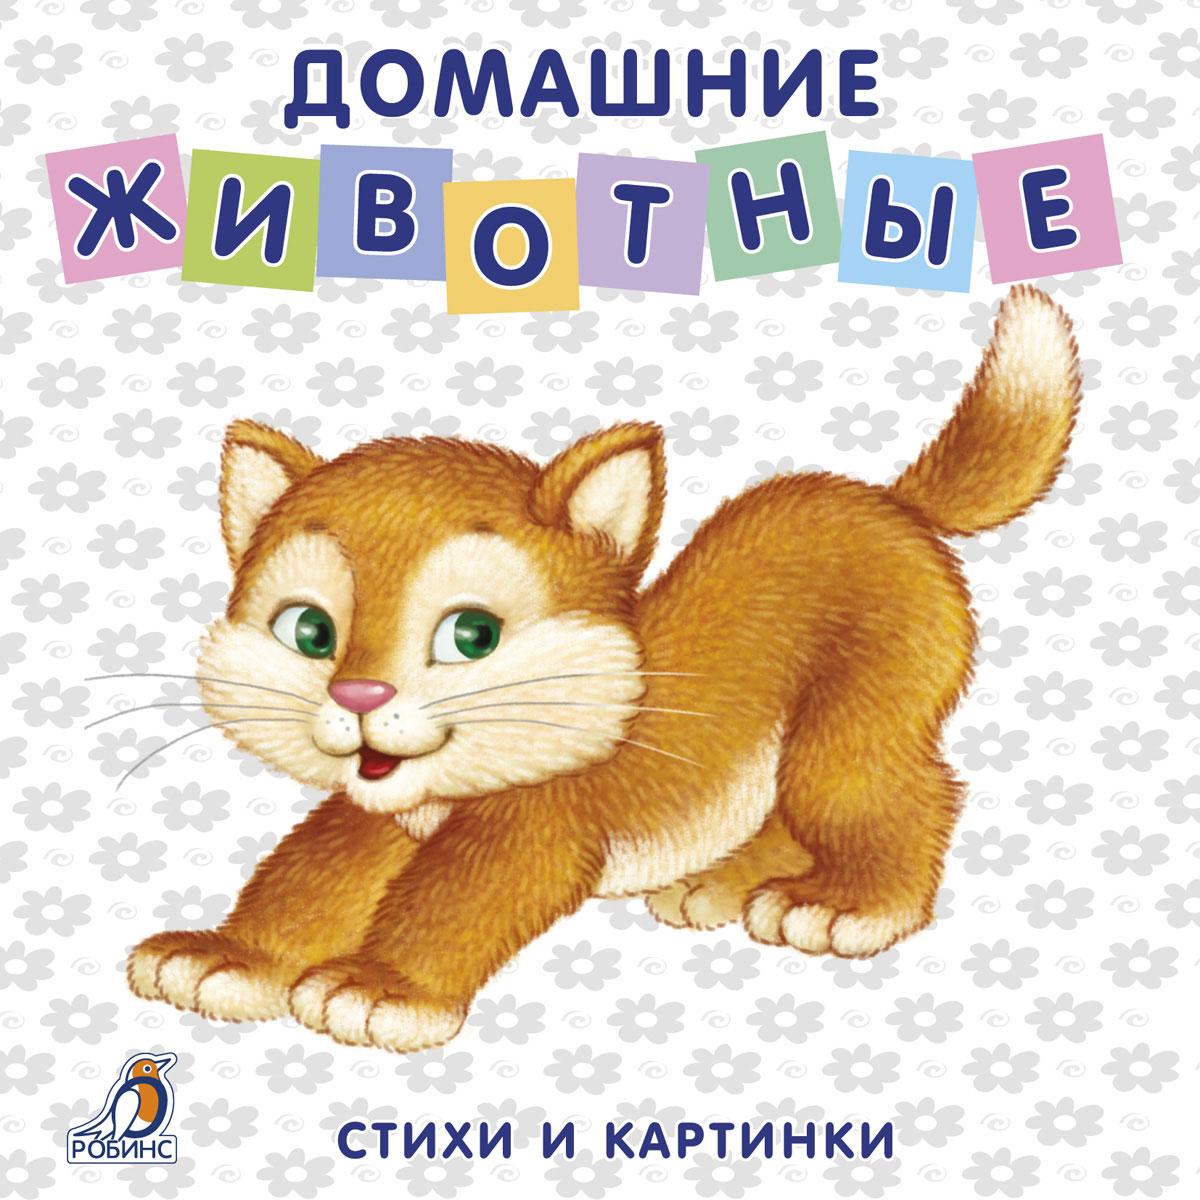 Домашние животные. Стихи и картинки котова е котята стихи для детей книжки игрушки ушки потягушки